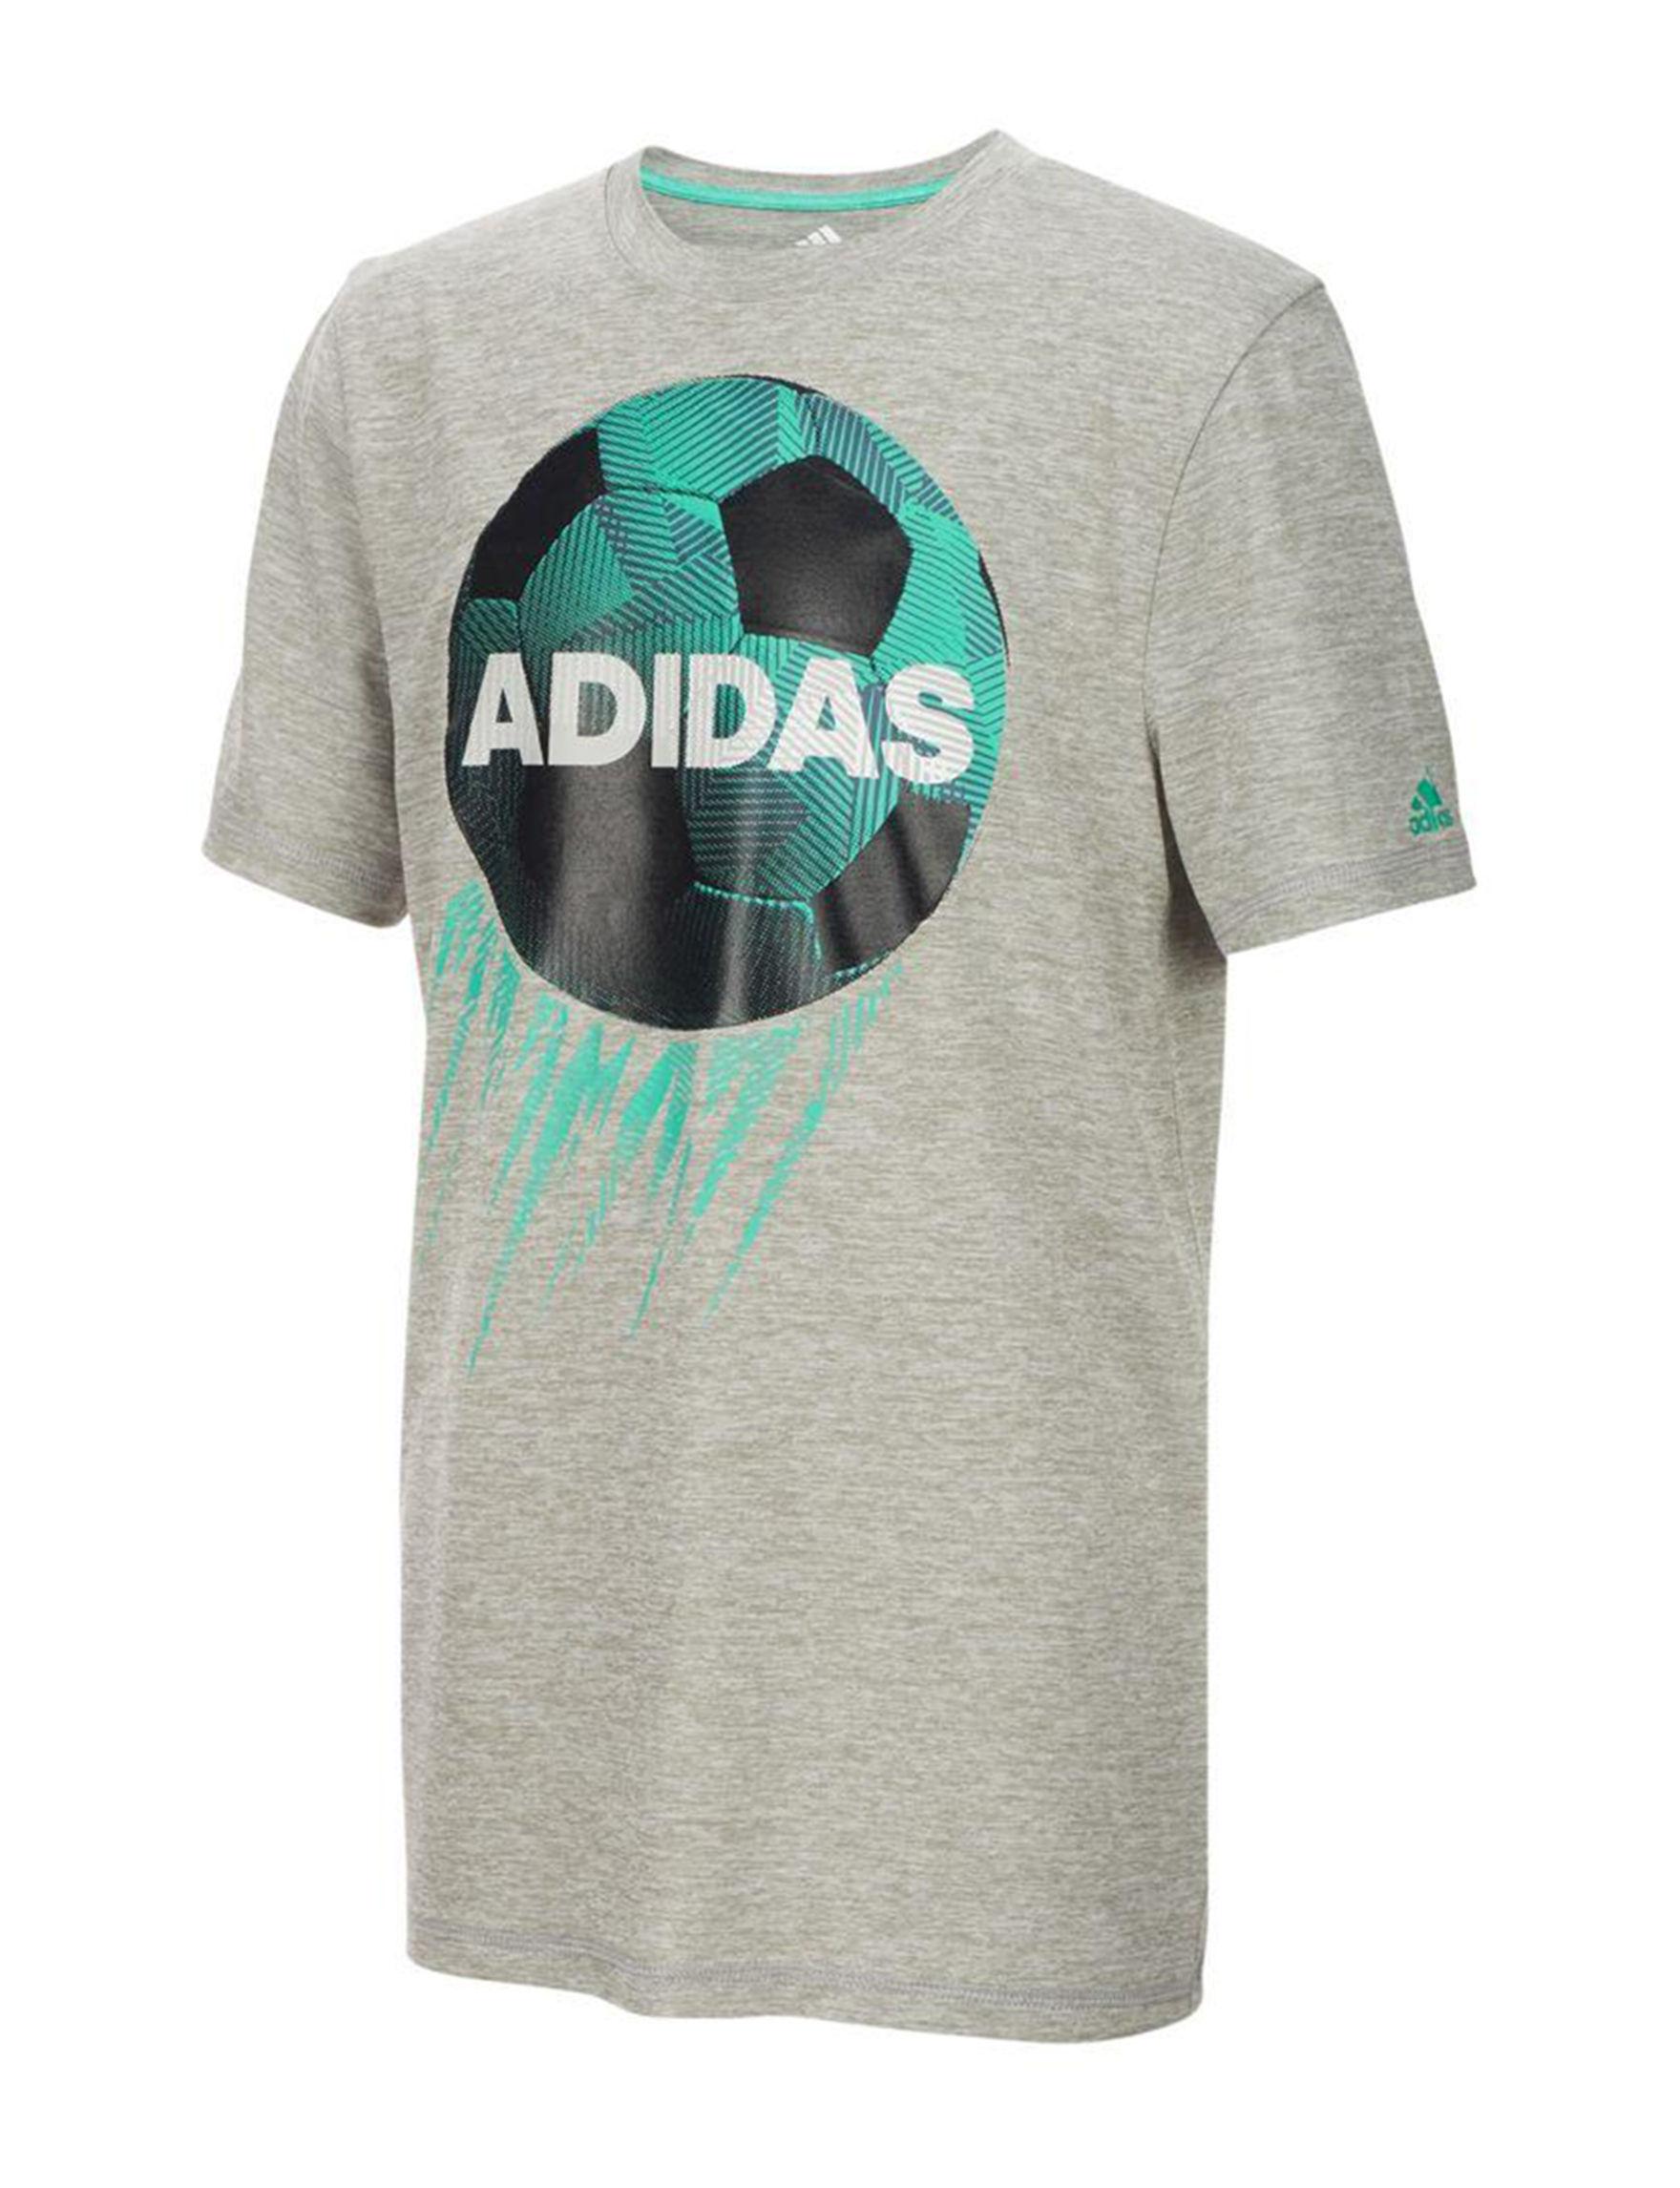 Adidas Heather Grey